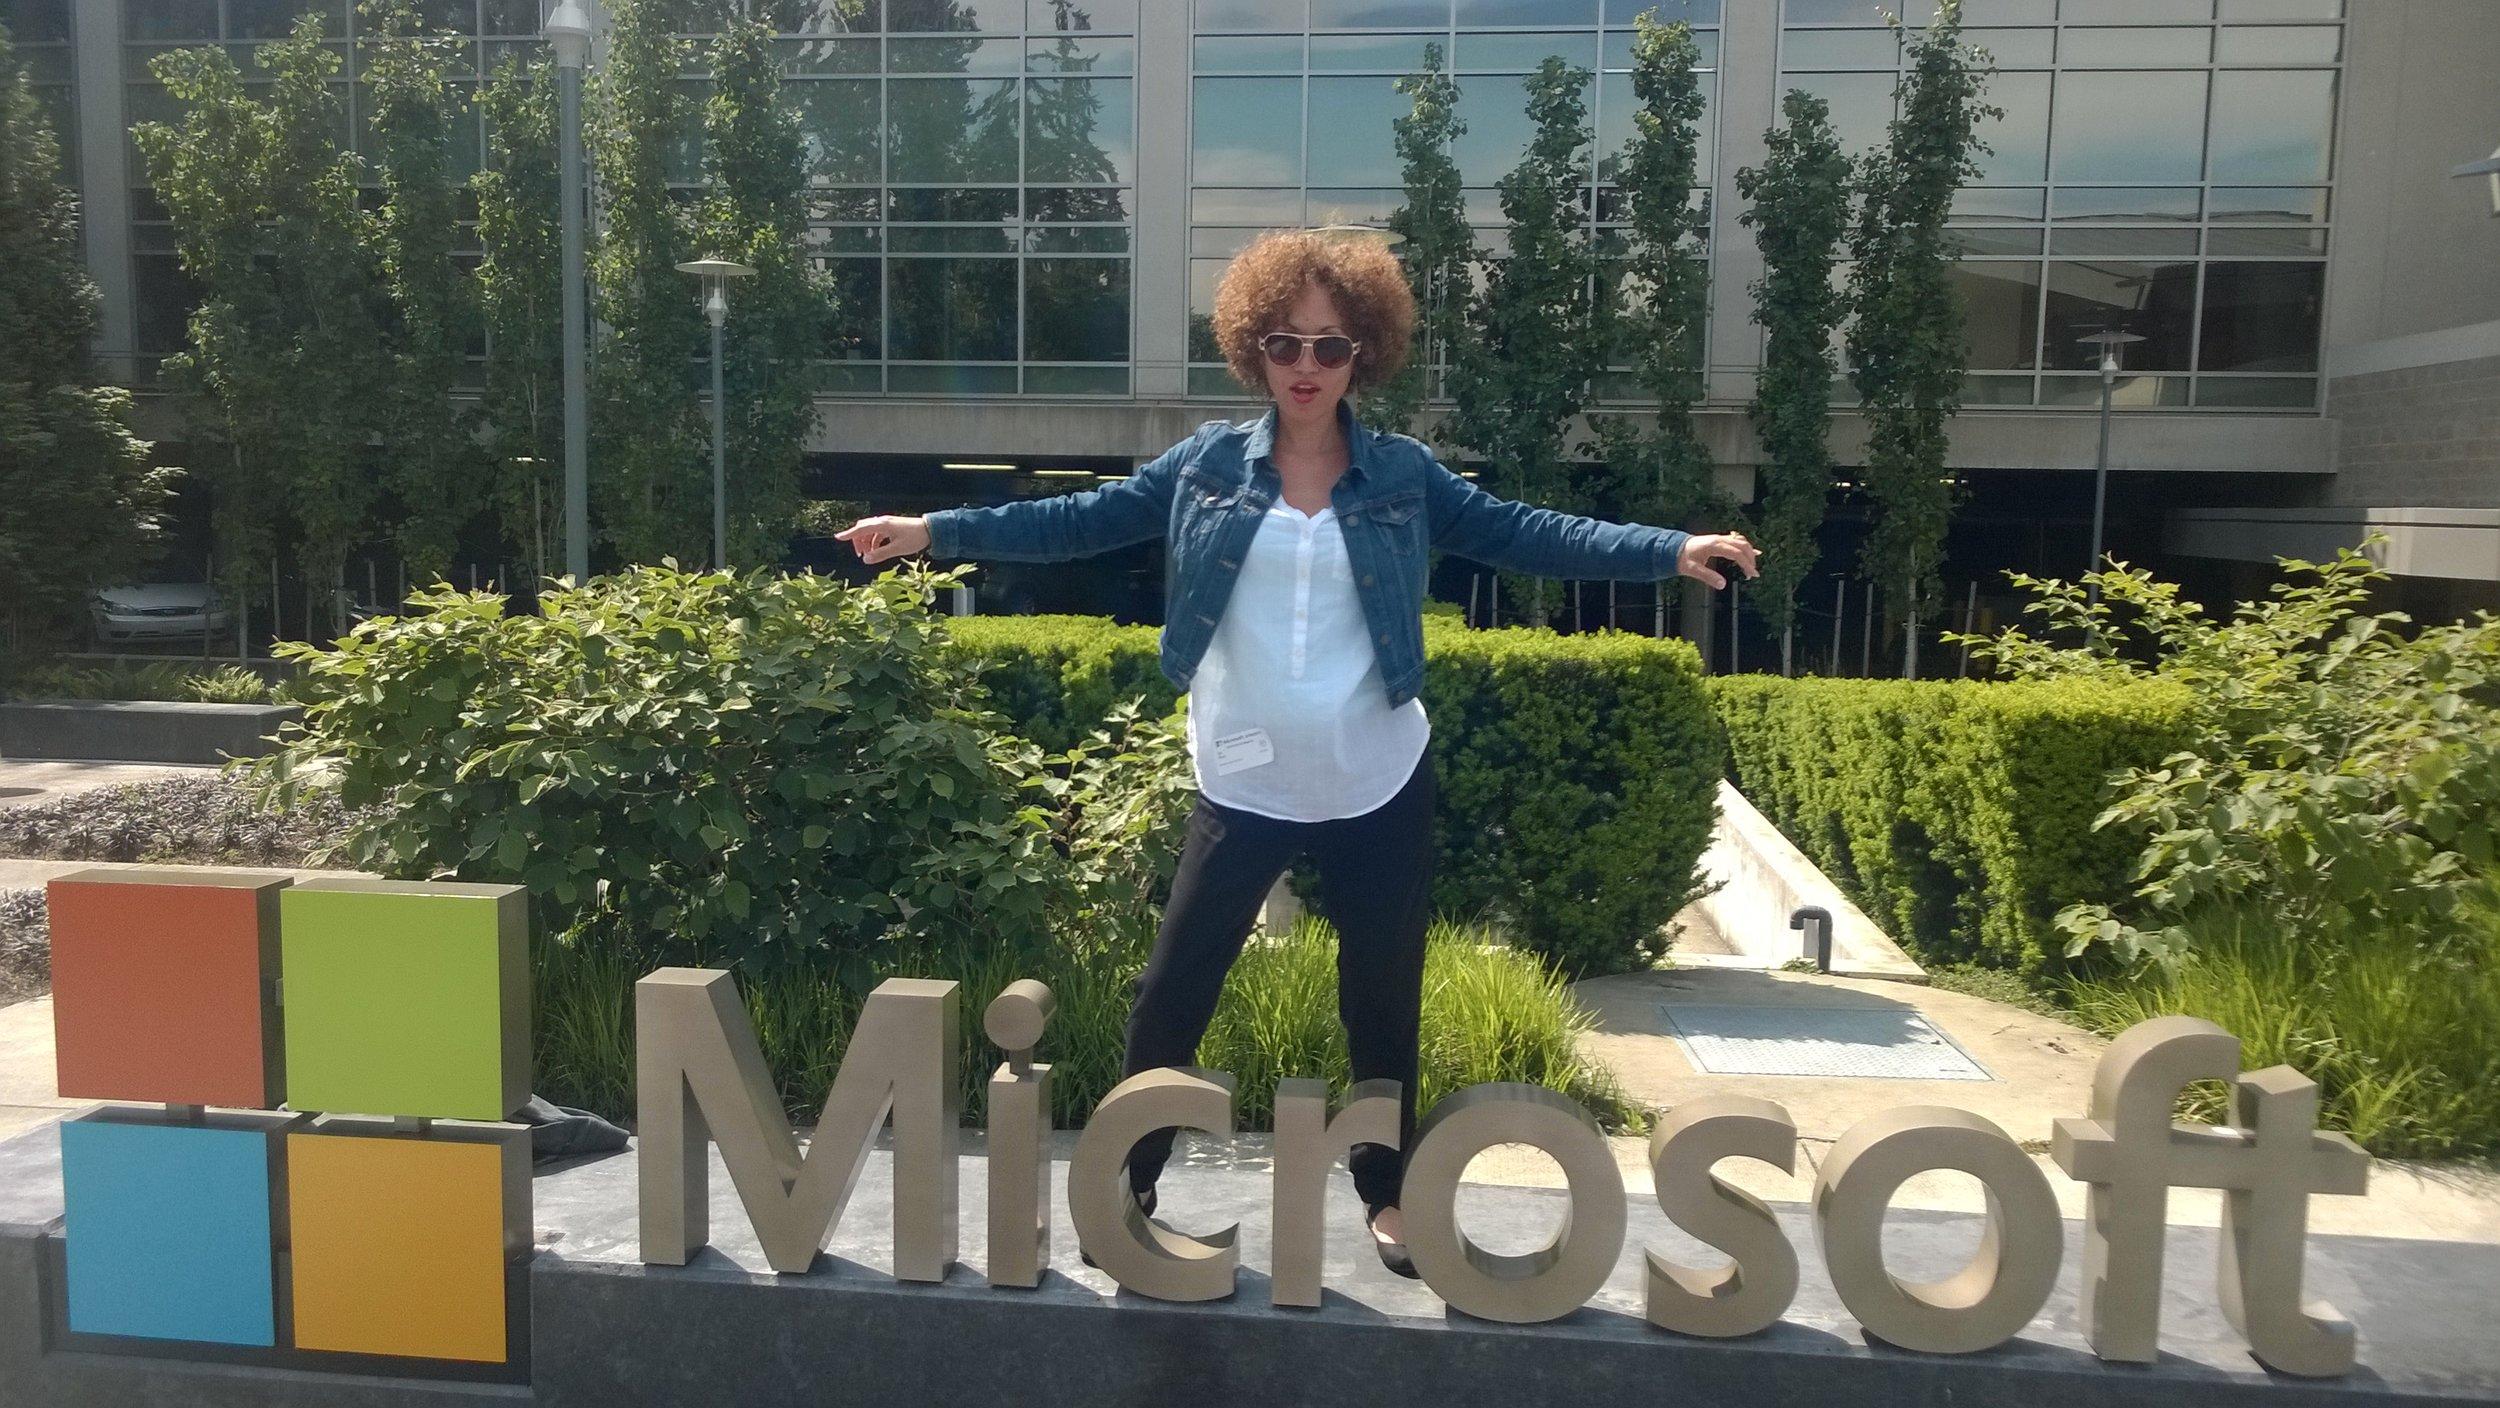 Sili Microsoft Sign